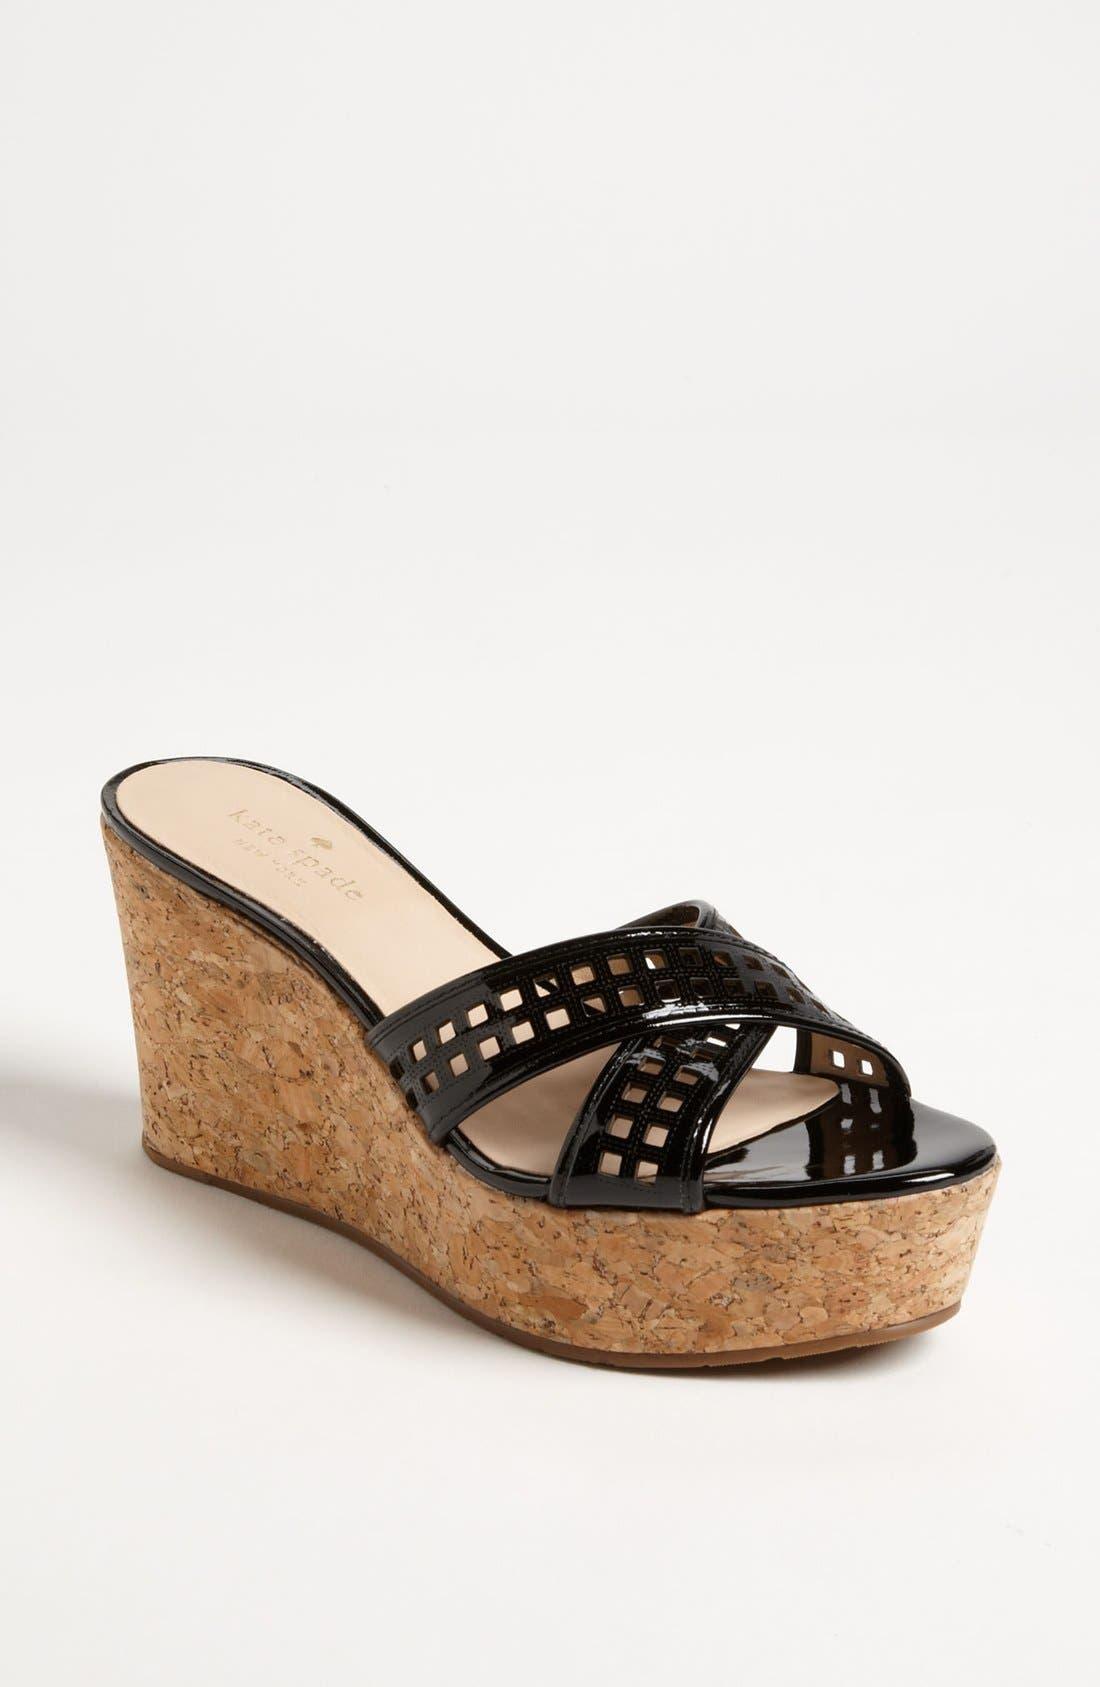 Main Image - kate spade new york 'tawny' sandal